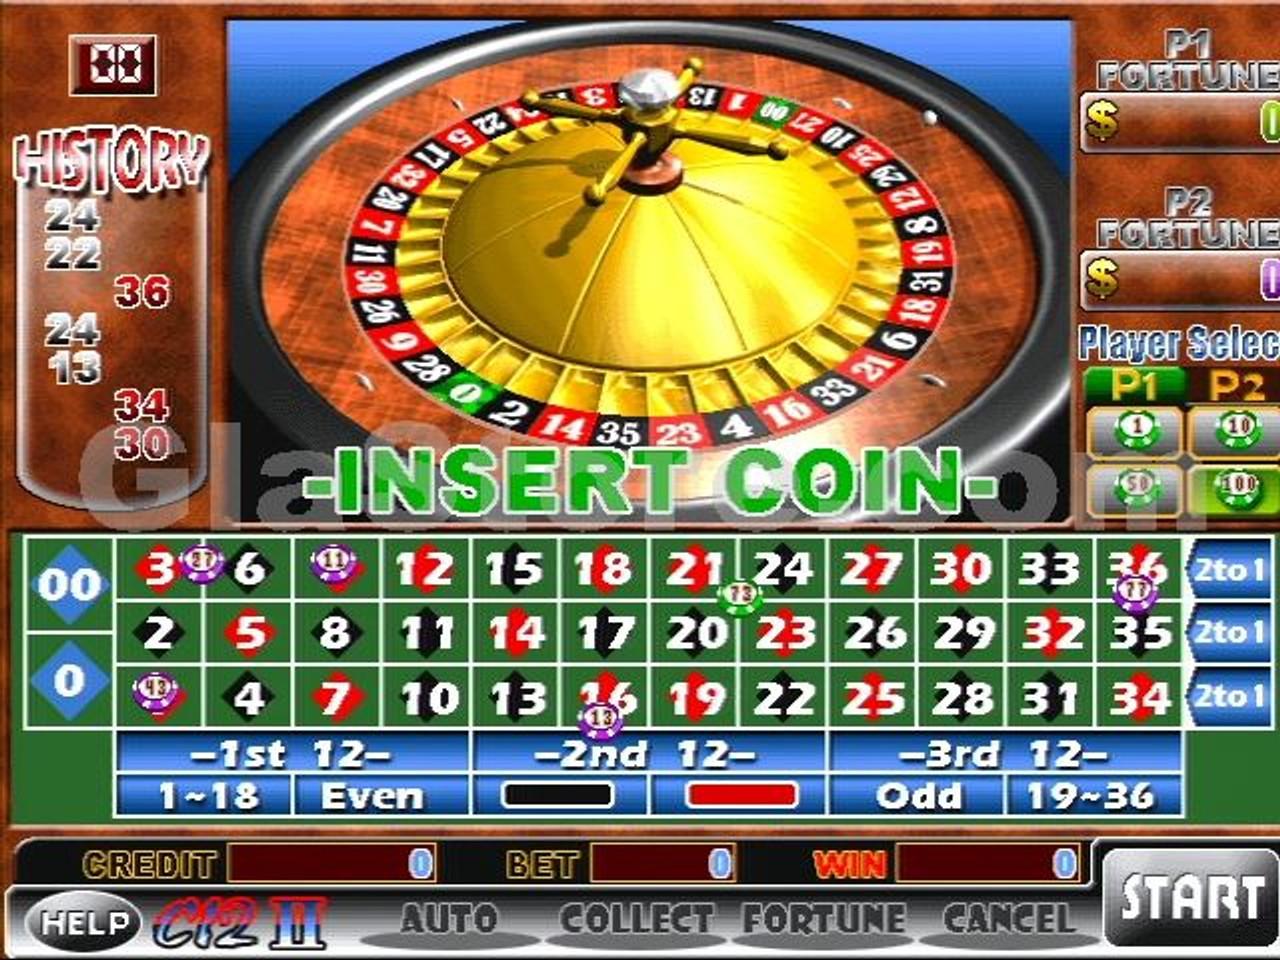 Does rbc visa allow online gambling